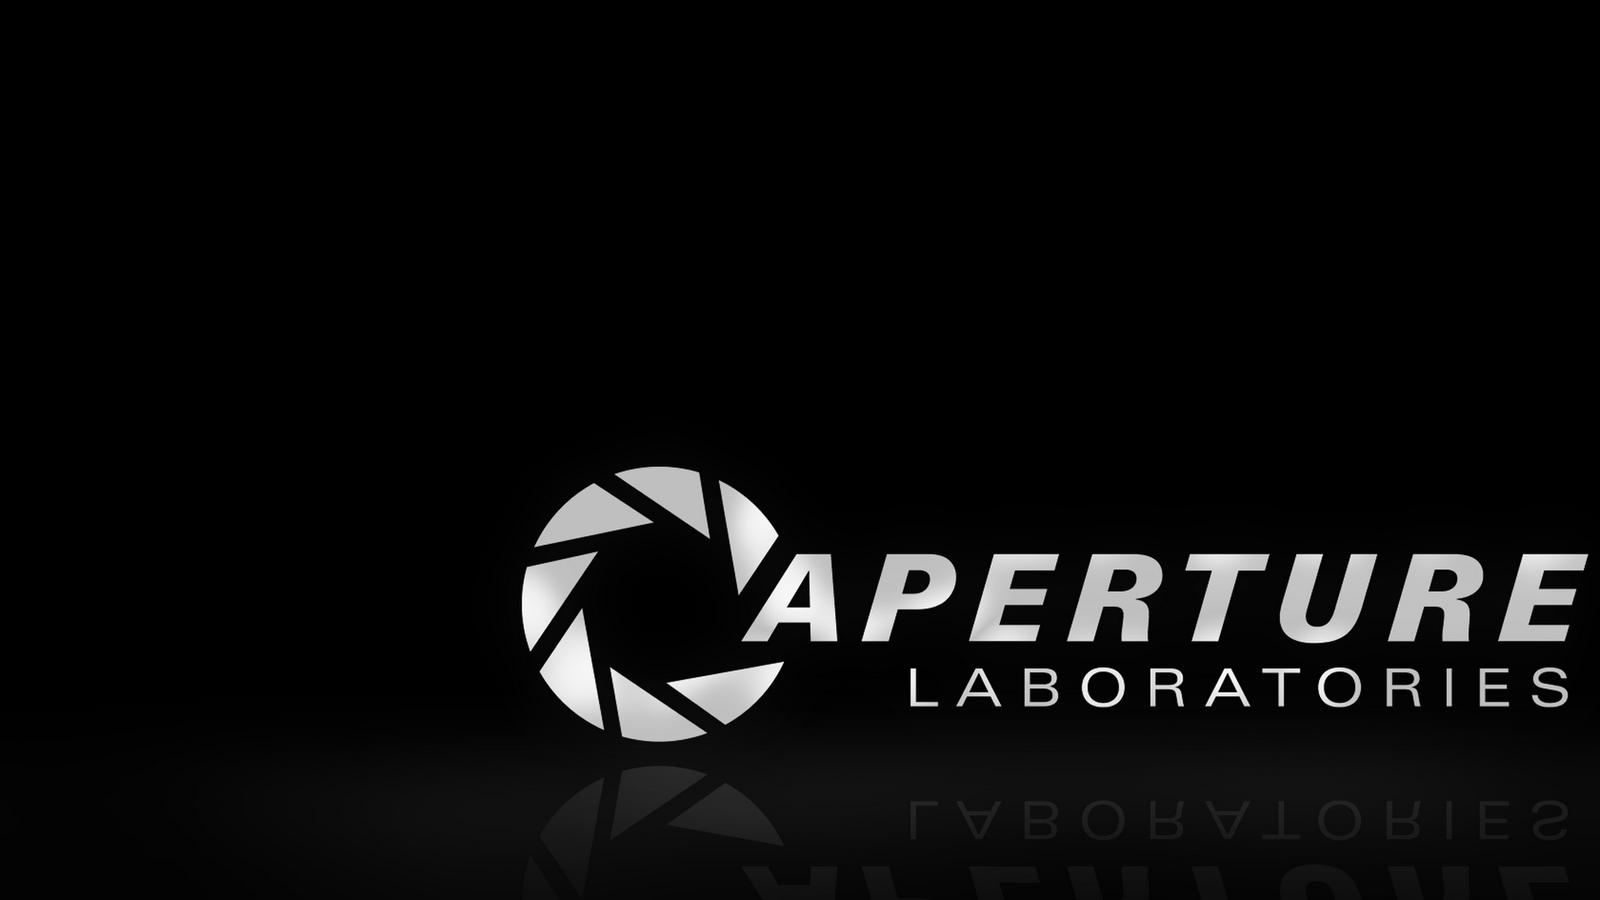 Aperture Laboratories Download 1920x1080 1600x900